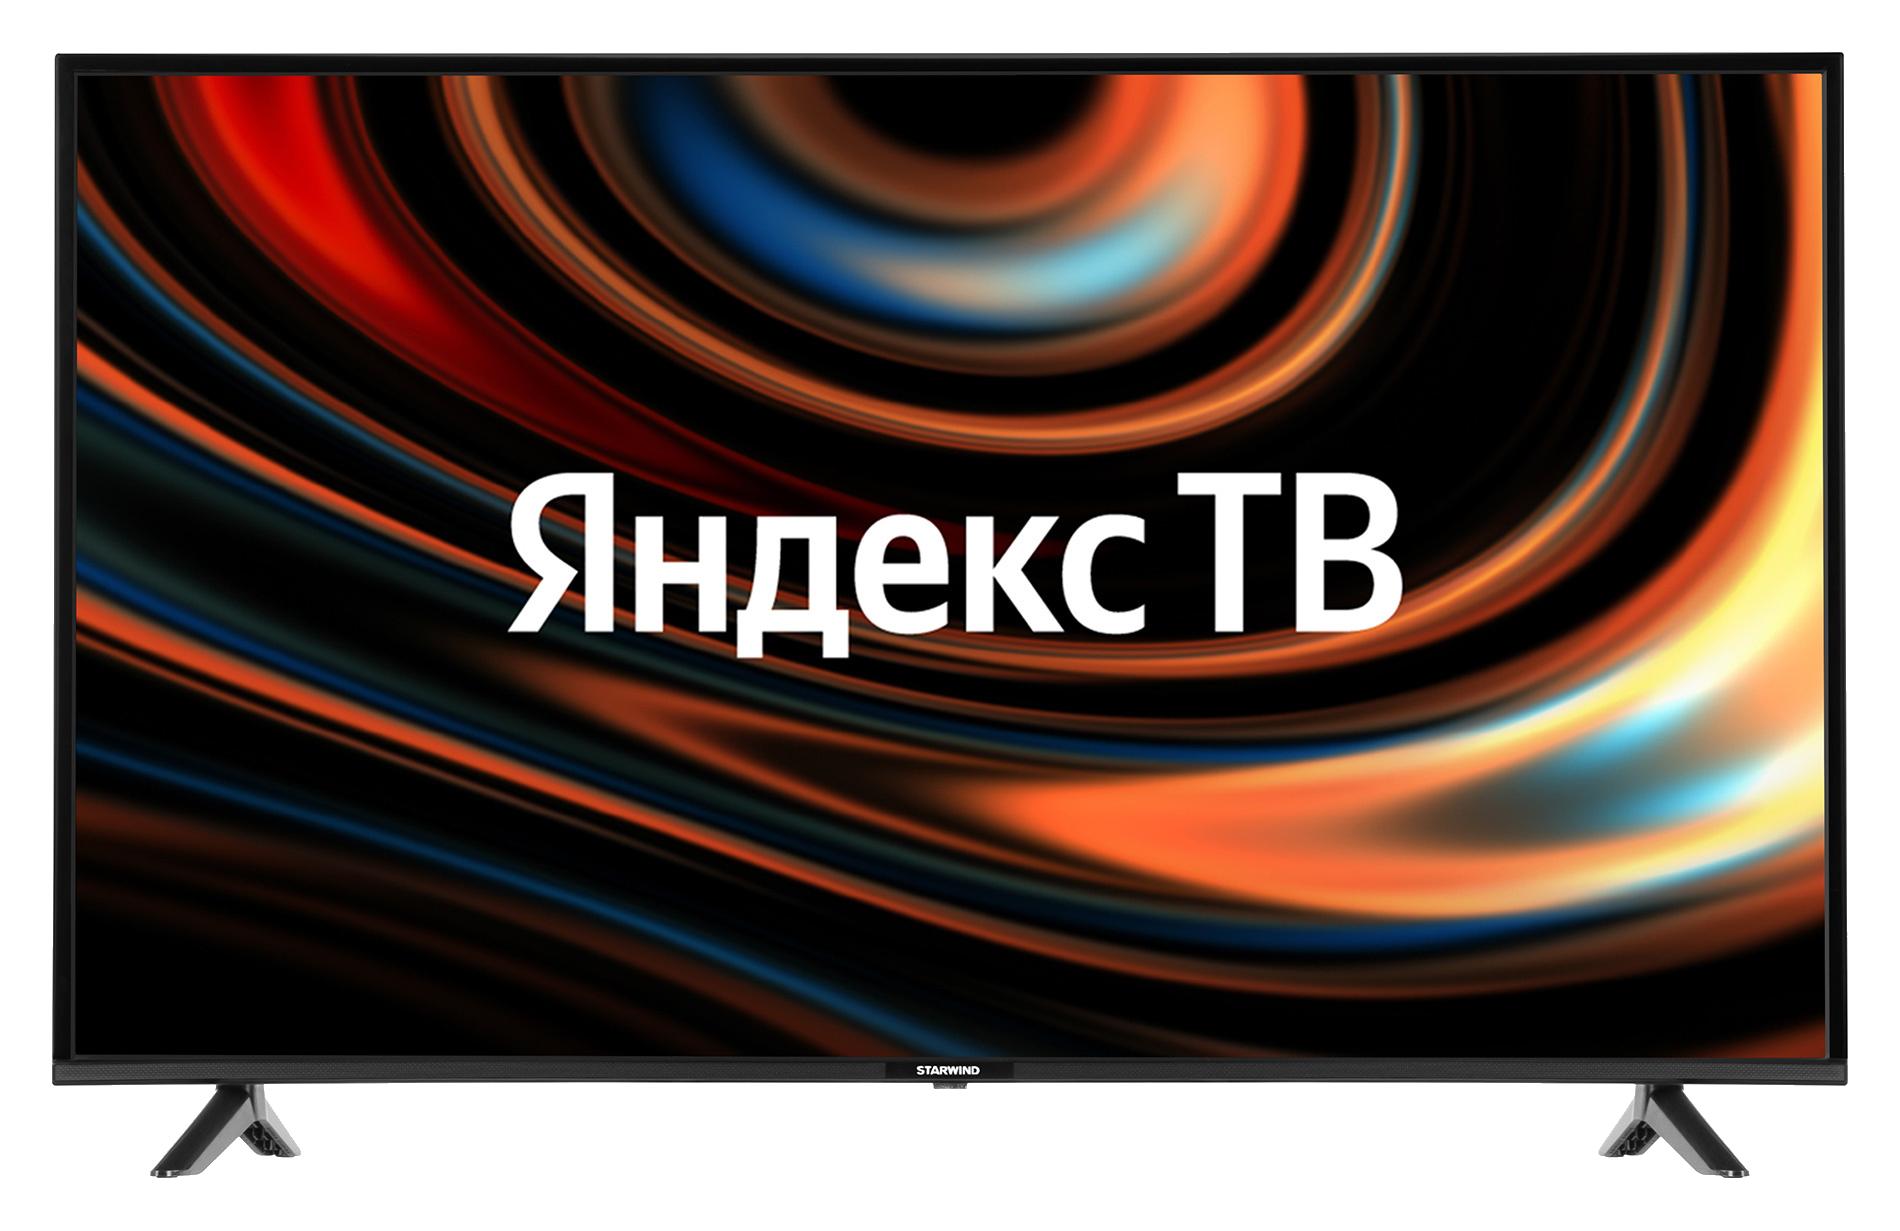 https://static.starwind.com.ru/img/menu/1451712.png